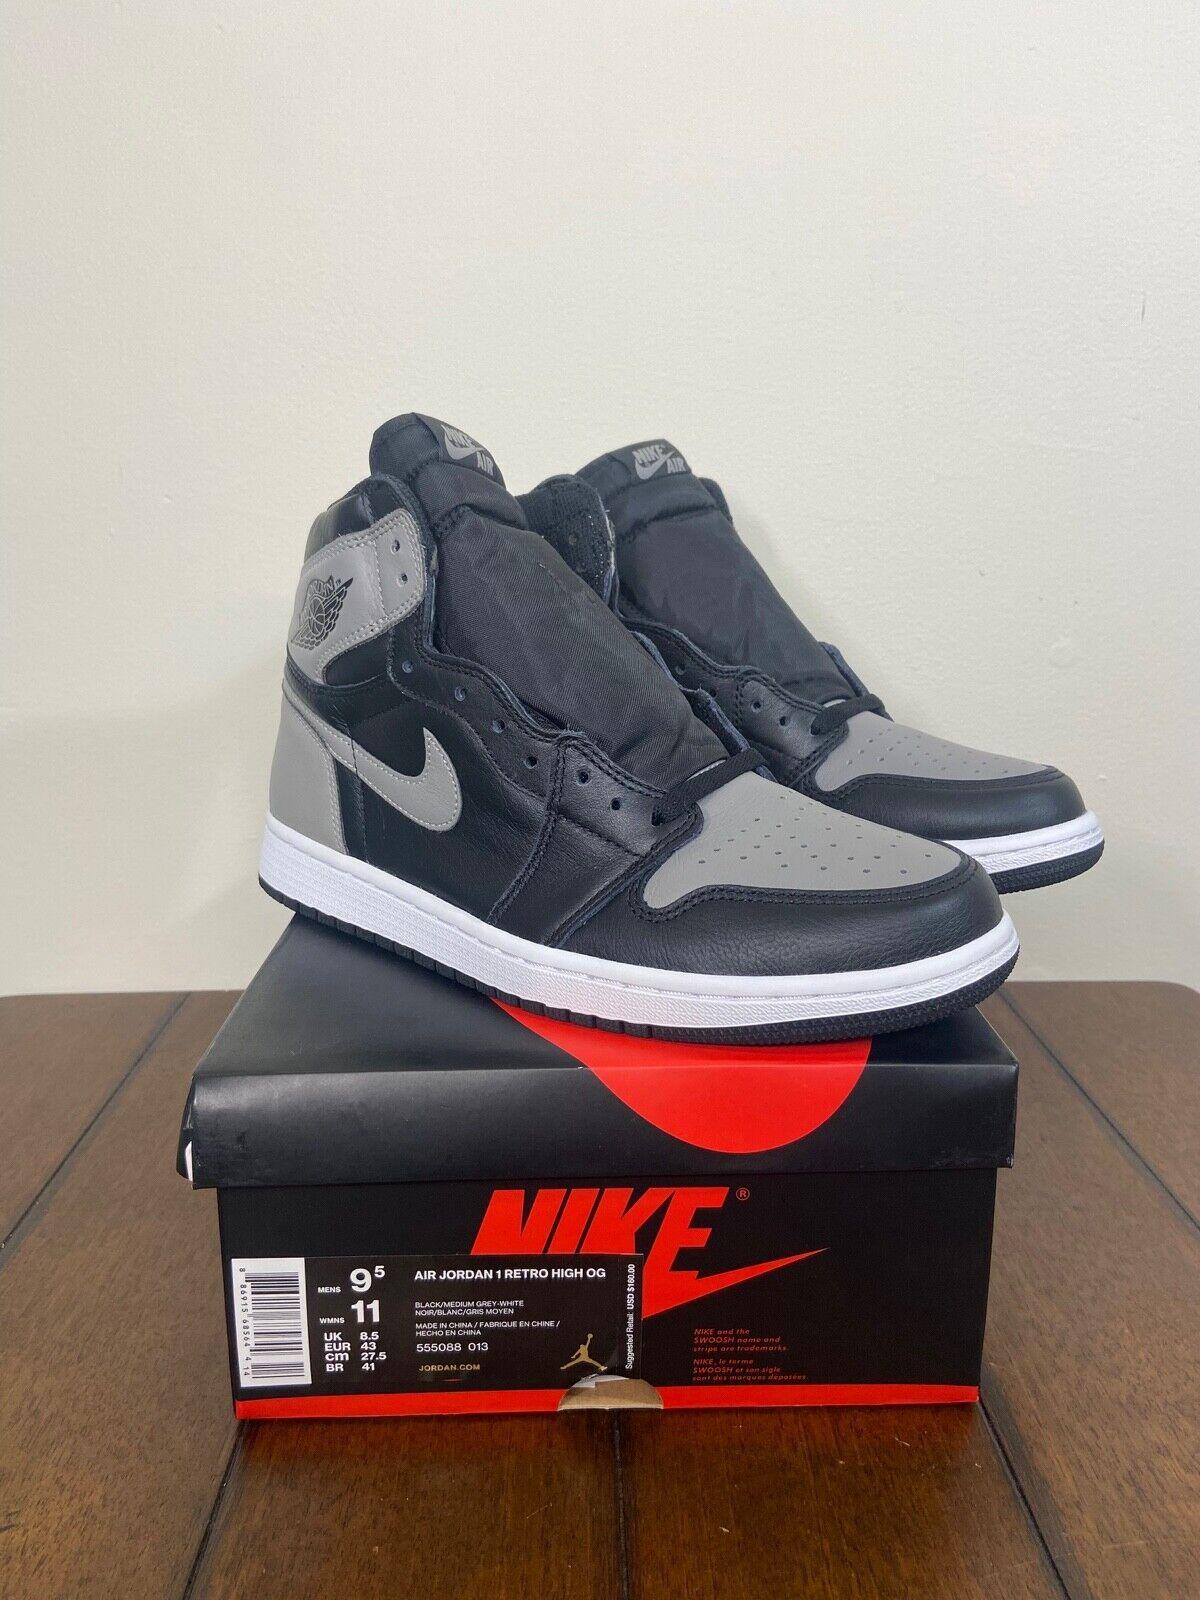 Size 9.5 - Jordan 1 Retro High OG Shadow 2018 for sale online   eBay